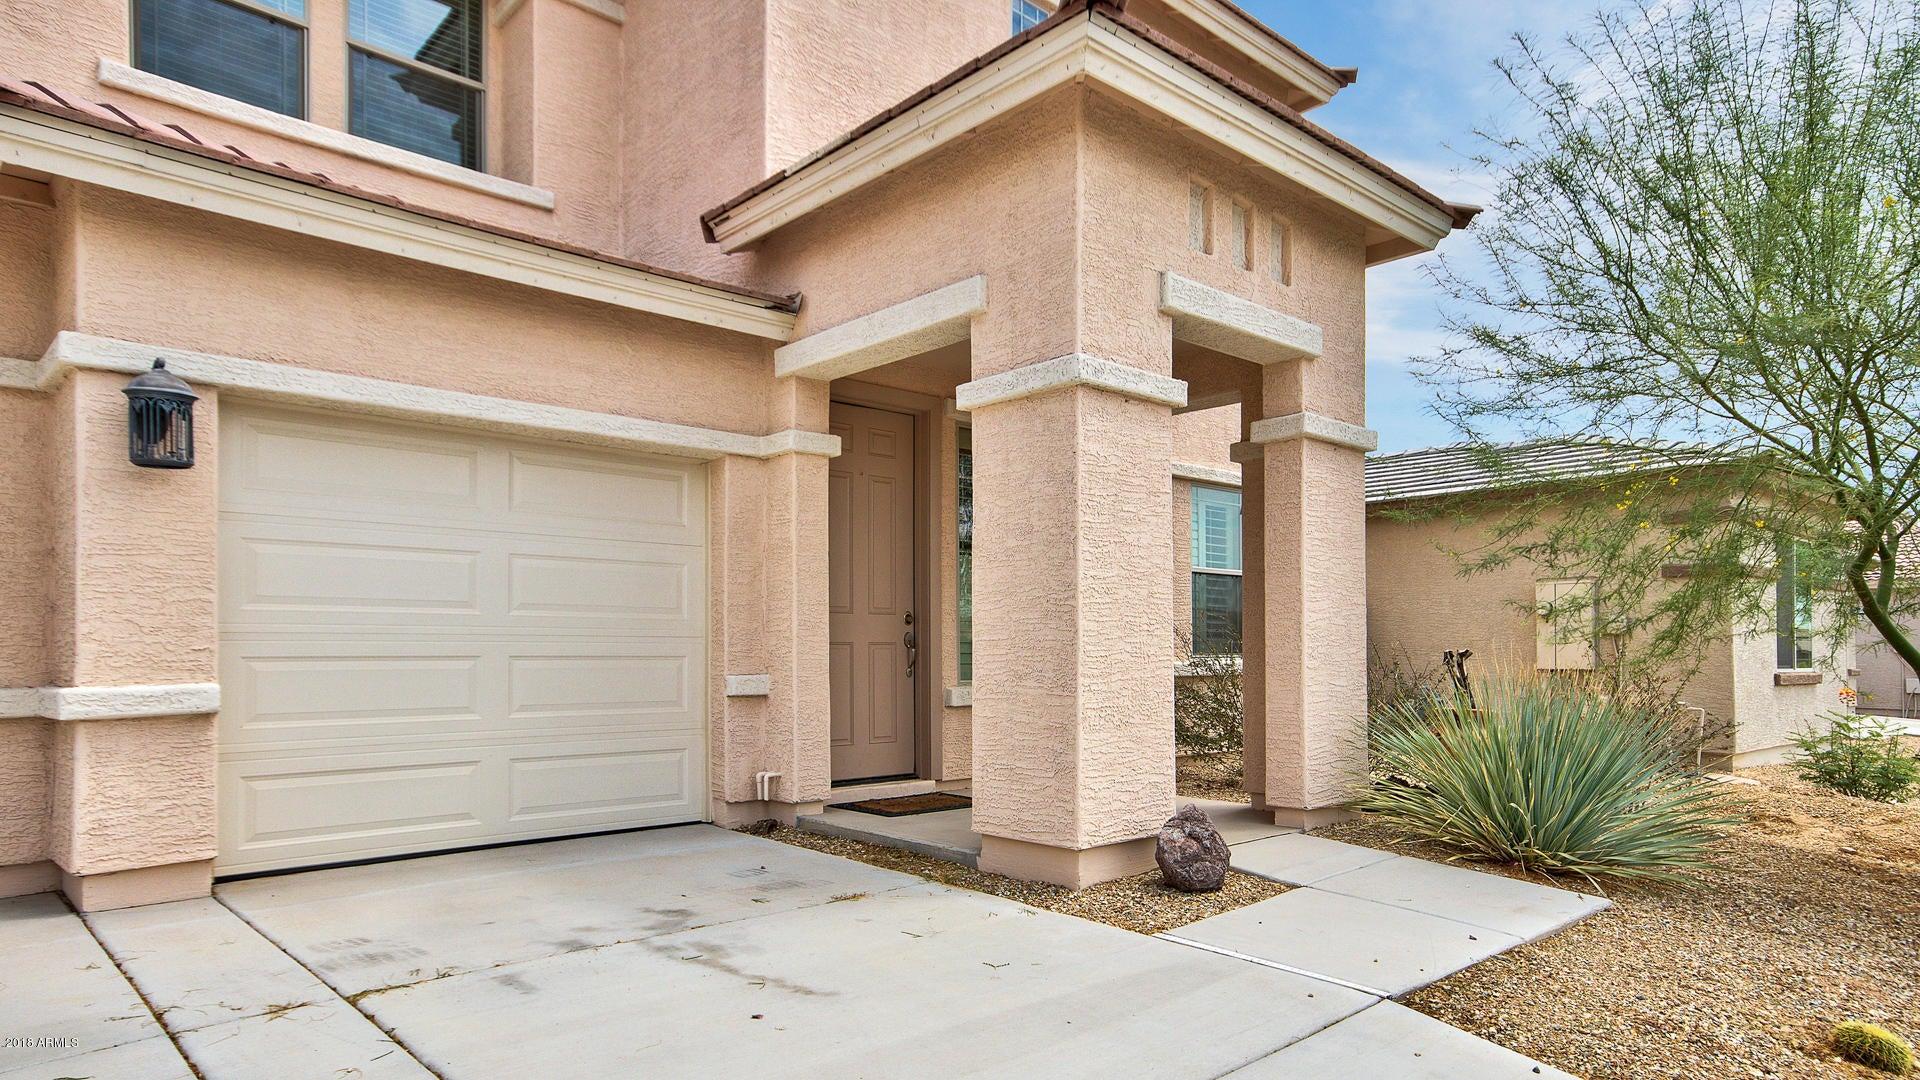 18630 W MOUNTAIN VIEW Road Waddell, AZ 85355 - MLS #: 5801506